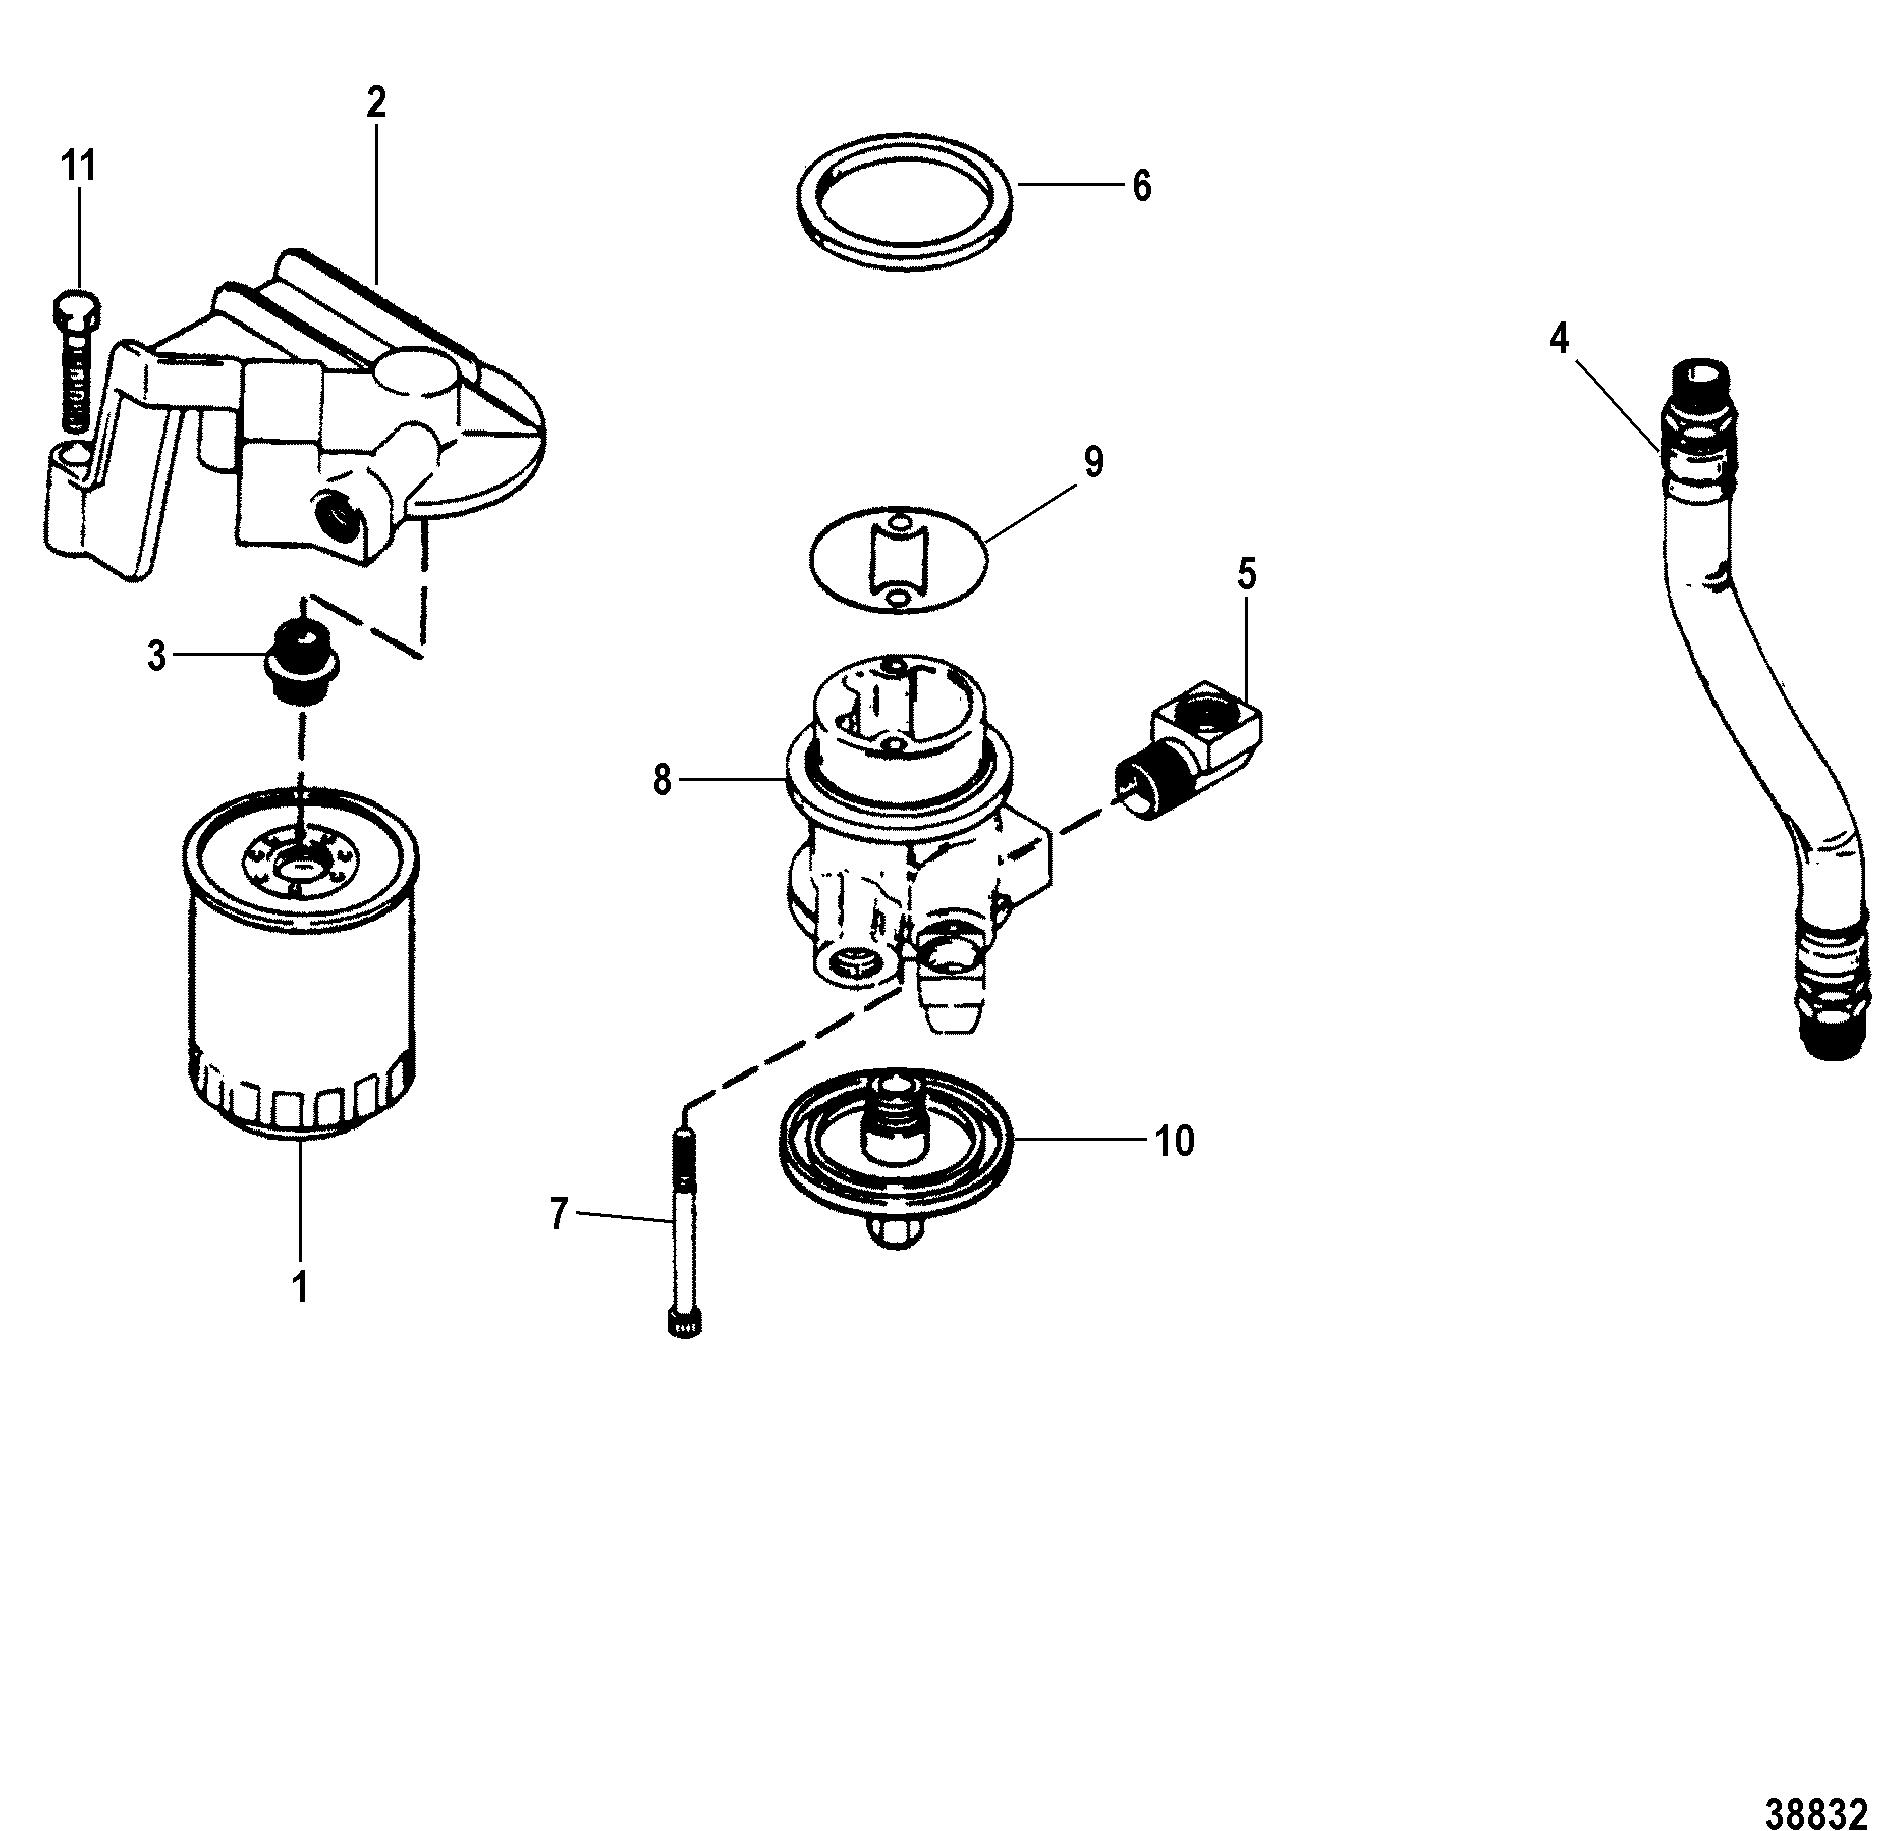 remote filter for mercruiser 4 3l 4 3lx alpha one engine 262 cid ii